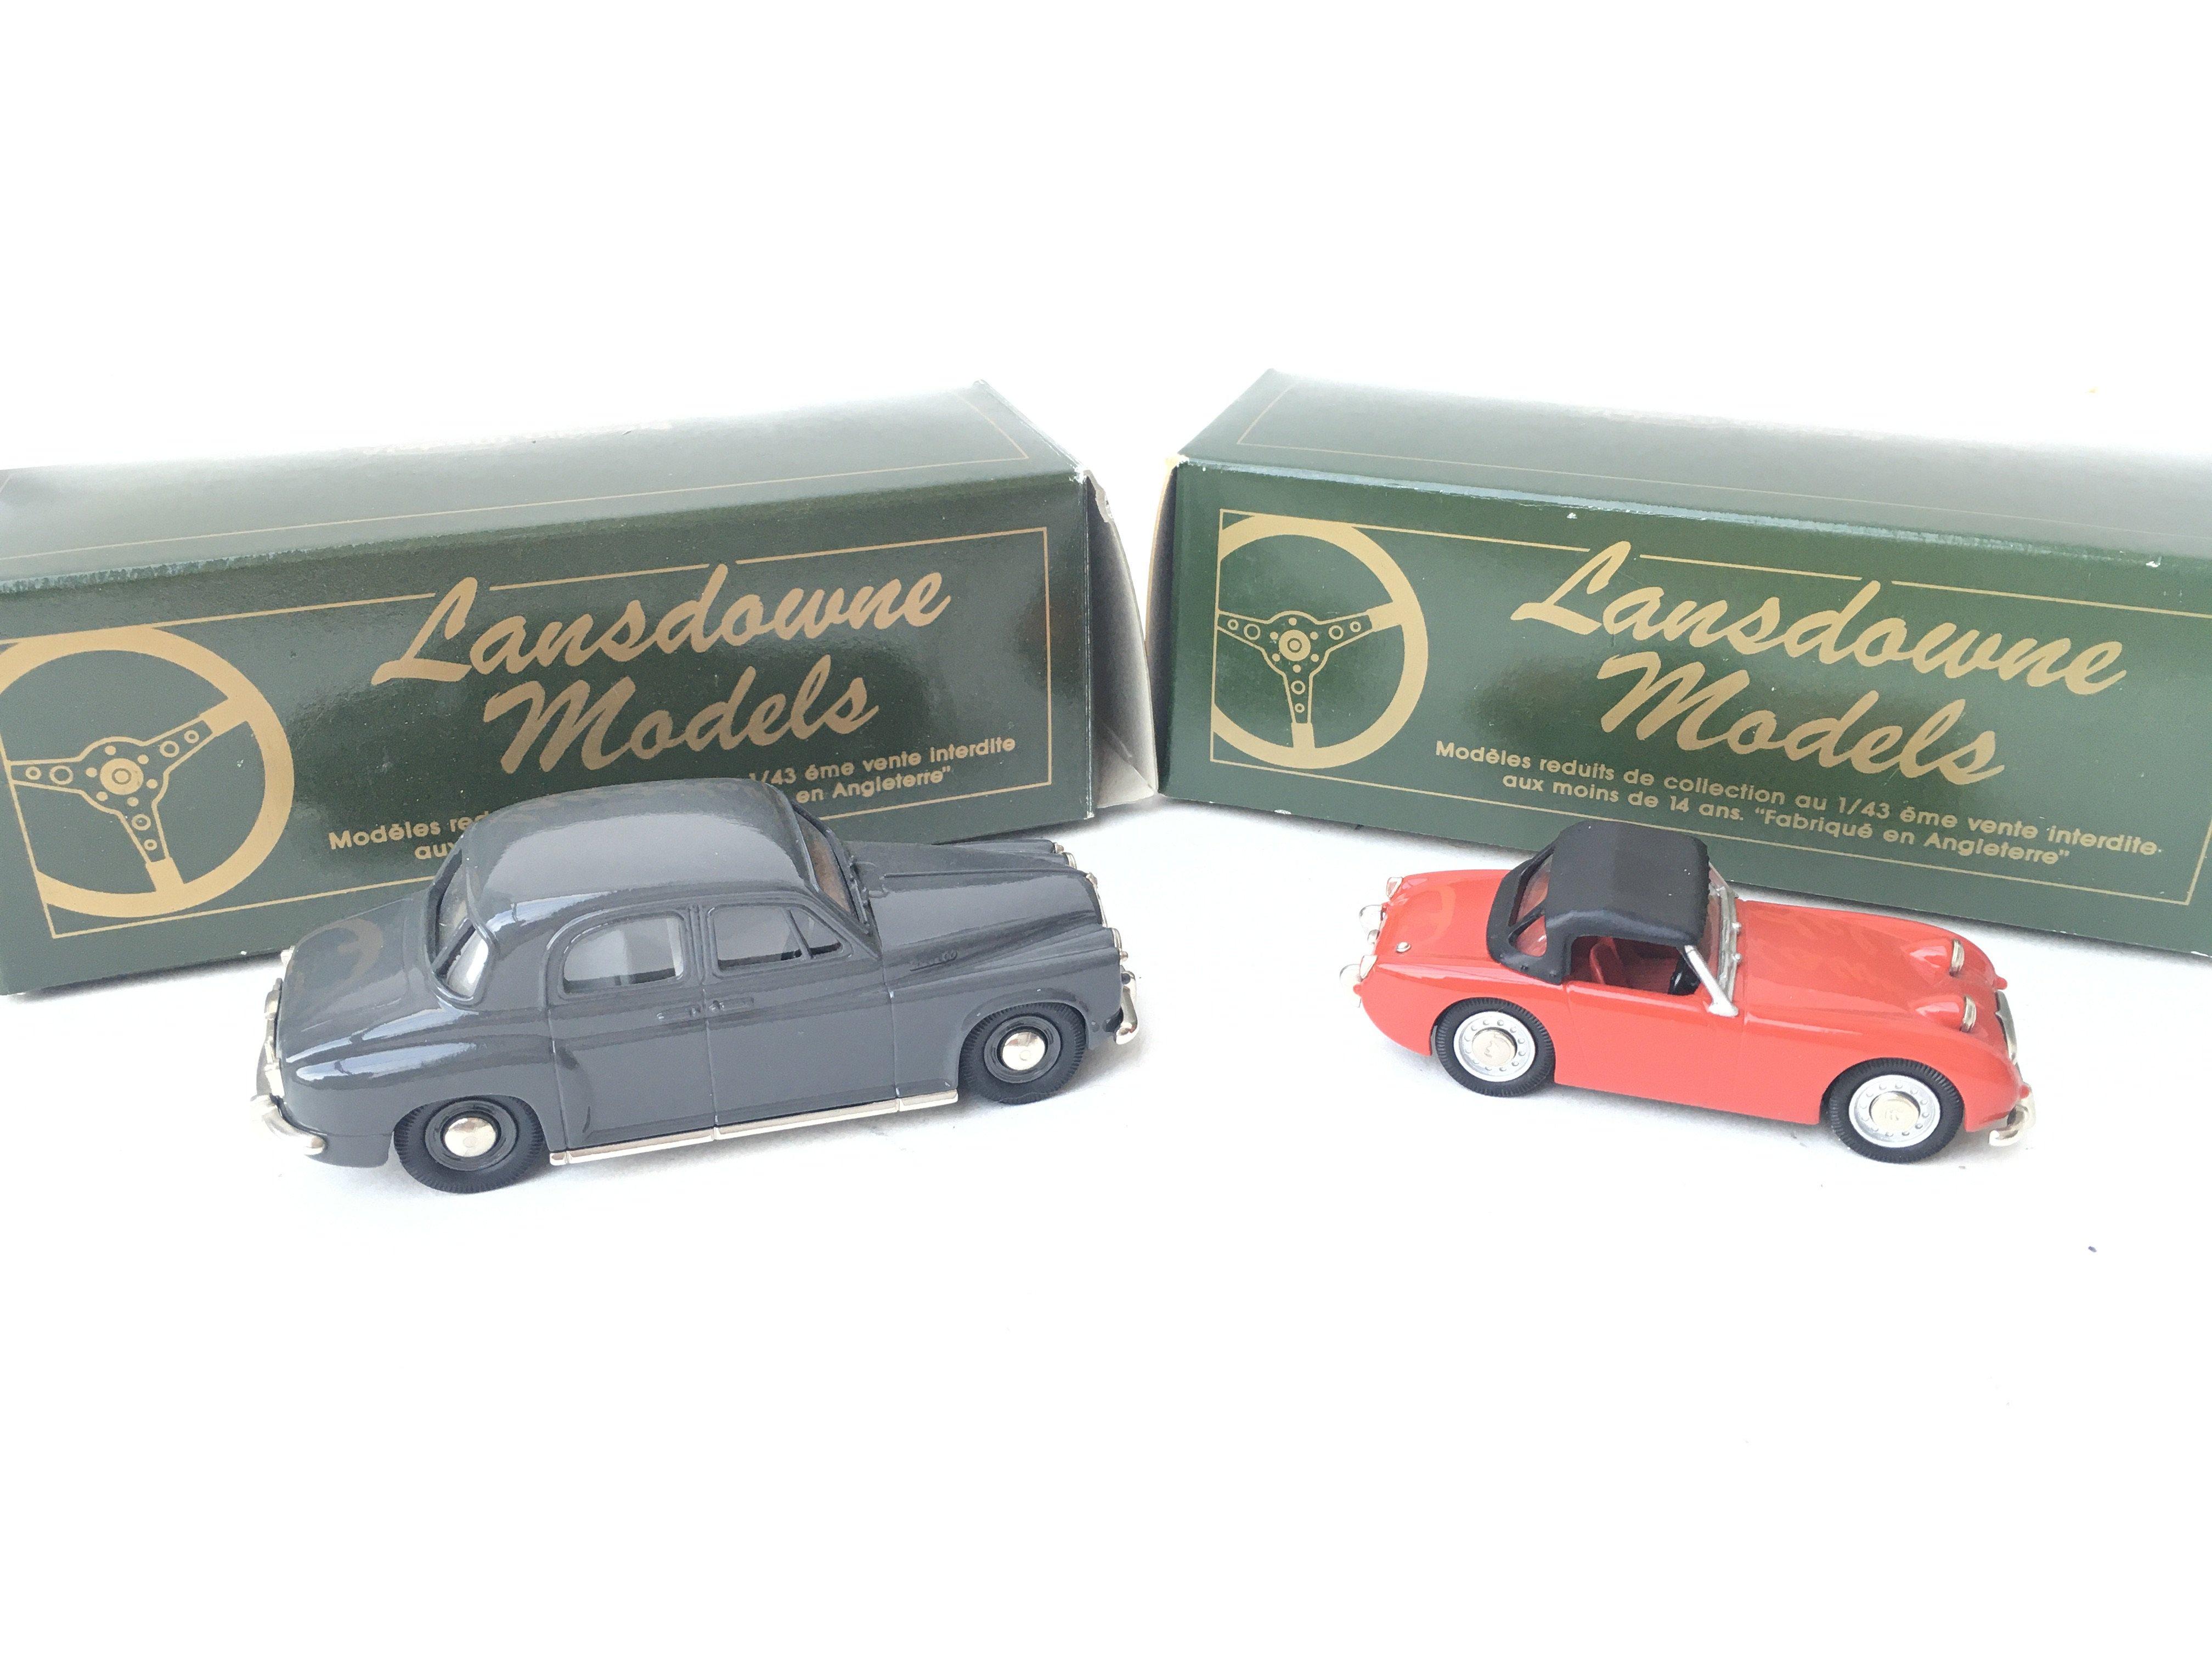 2 X Lansdowne Models including LDM.5 1957 Rover P4